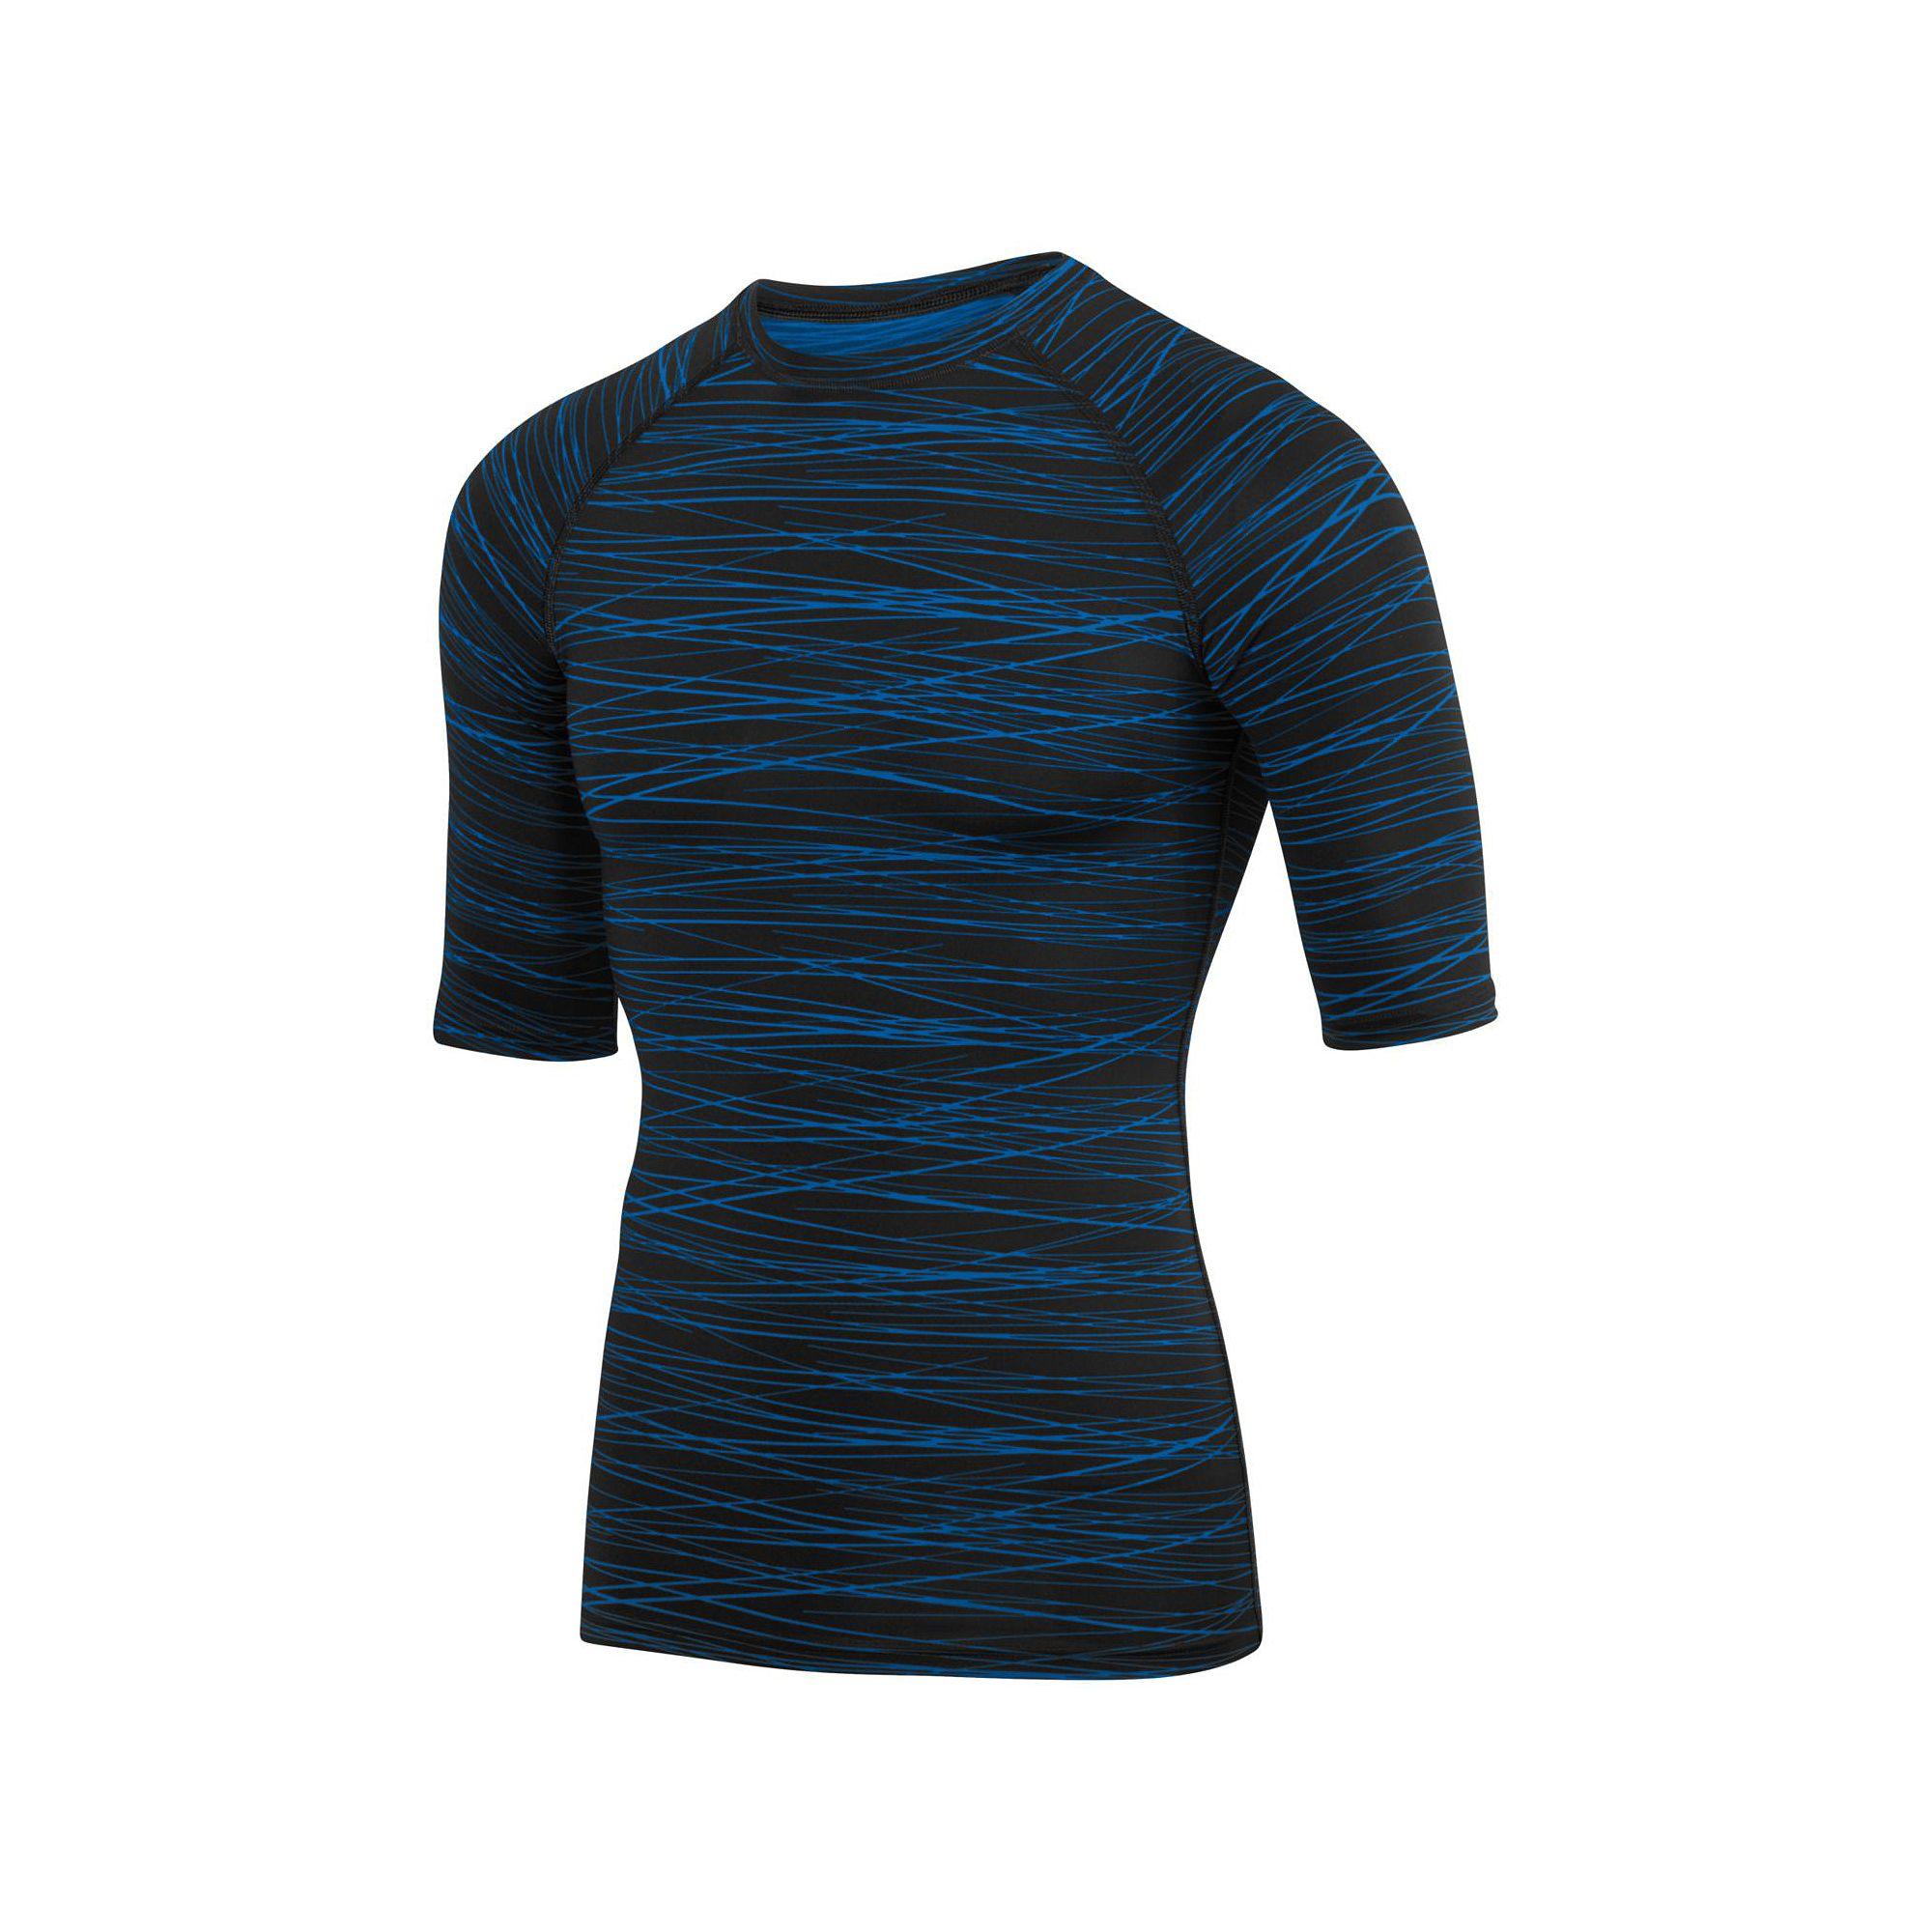 a6a076f82 Men s Hyperform Compression Half Sleeve Shirt